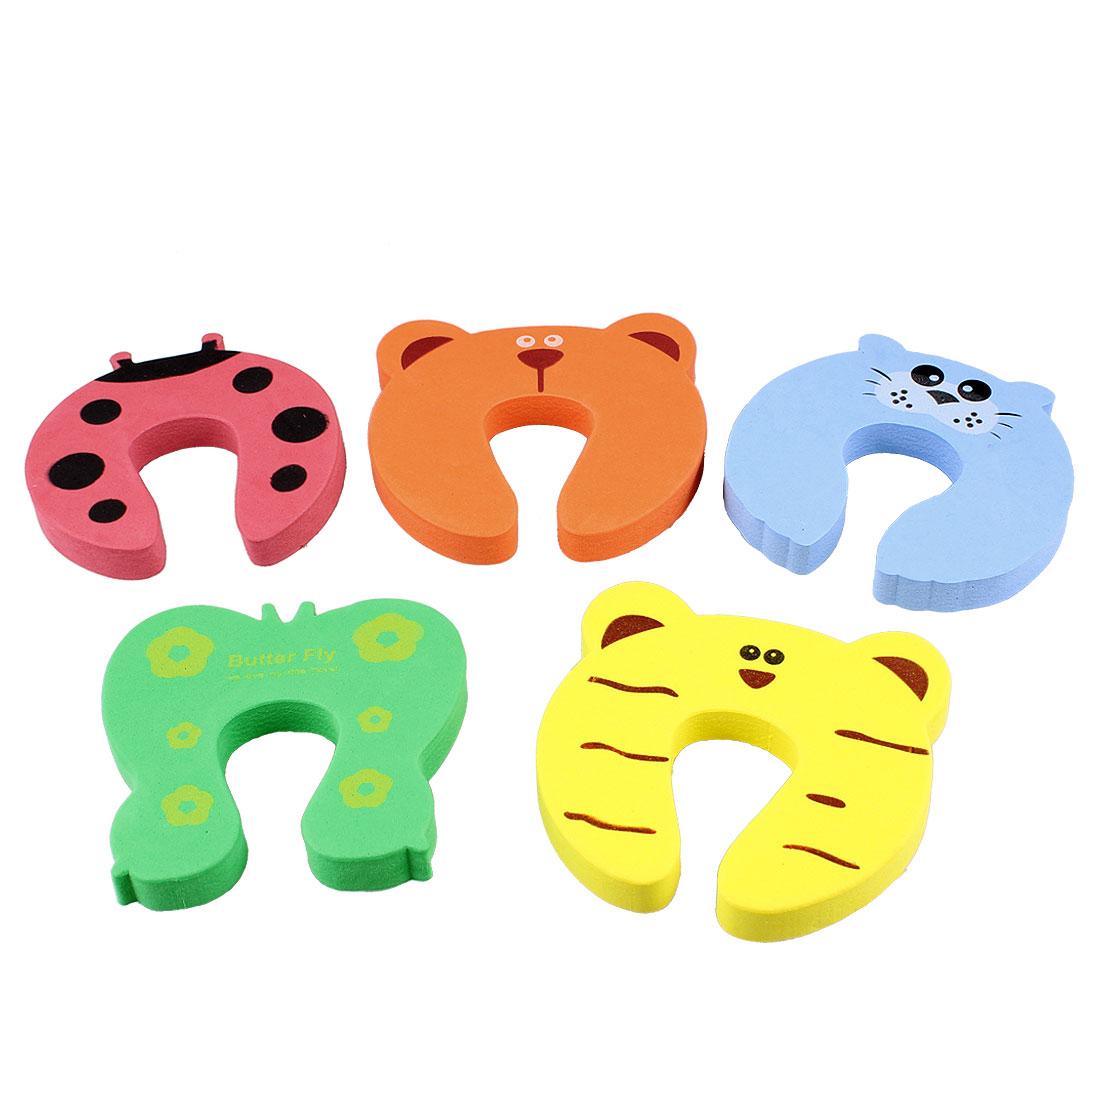 5 Pcs Finger Pinch Cartoon Animal Foam Door Stopper Cushion